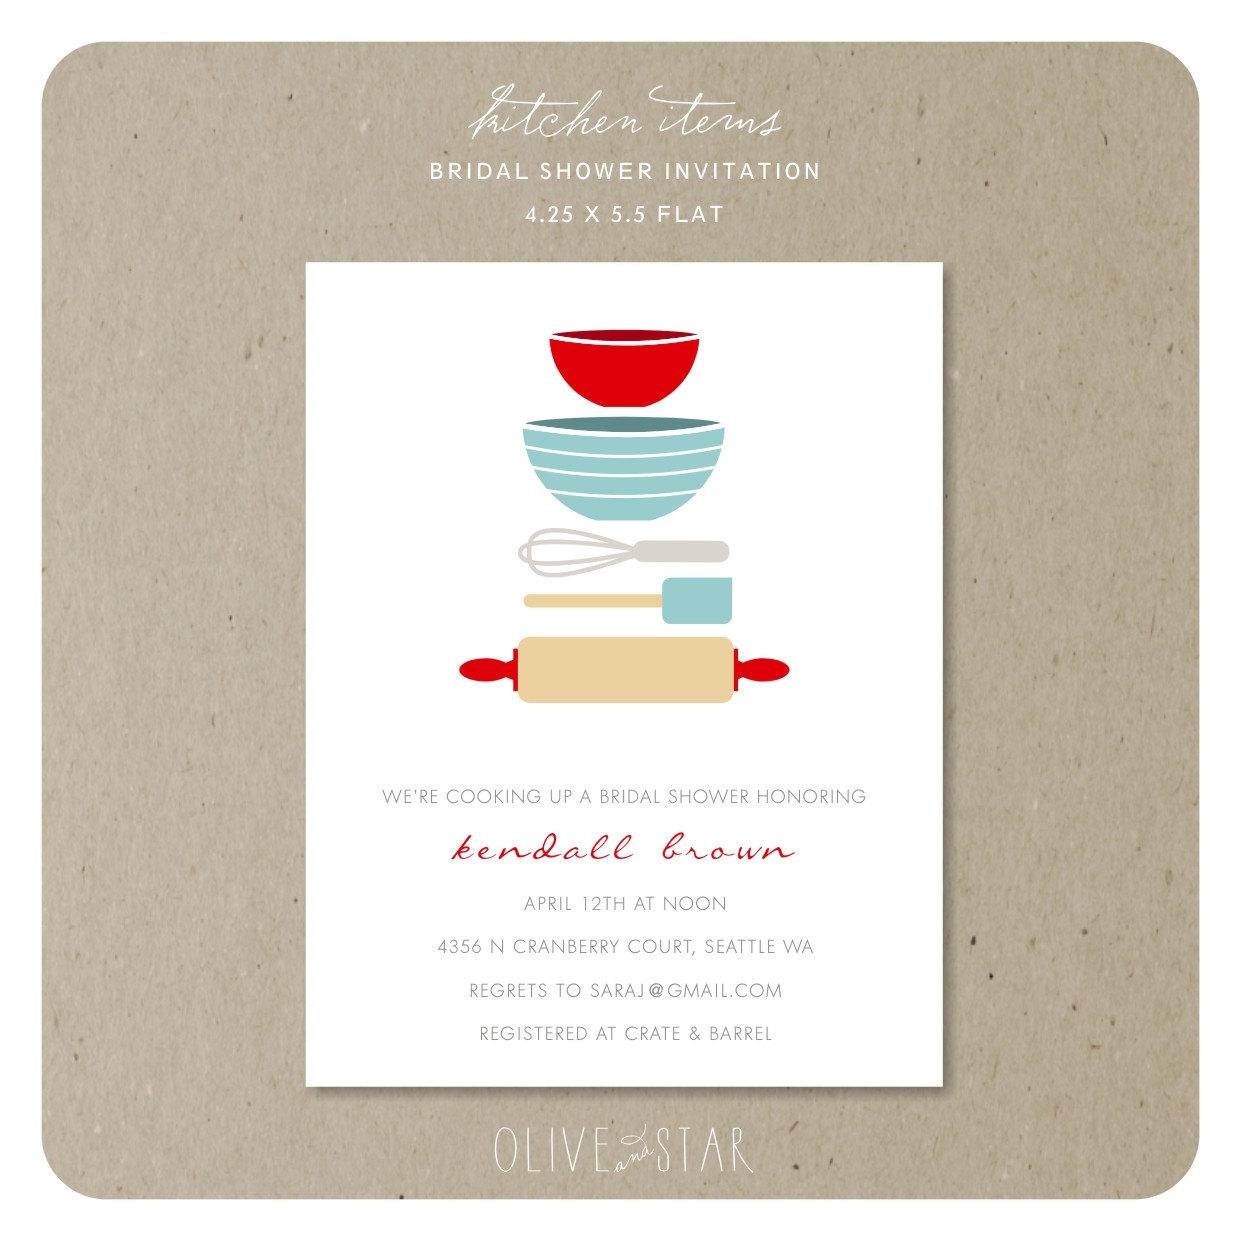 Kitchen Baking Items // Bridal Shower Invitation By